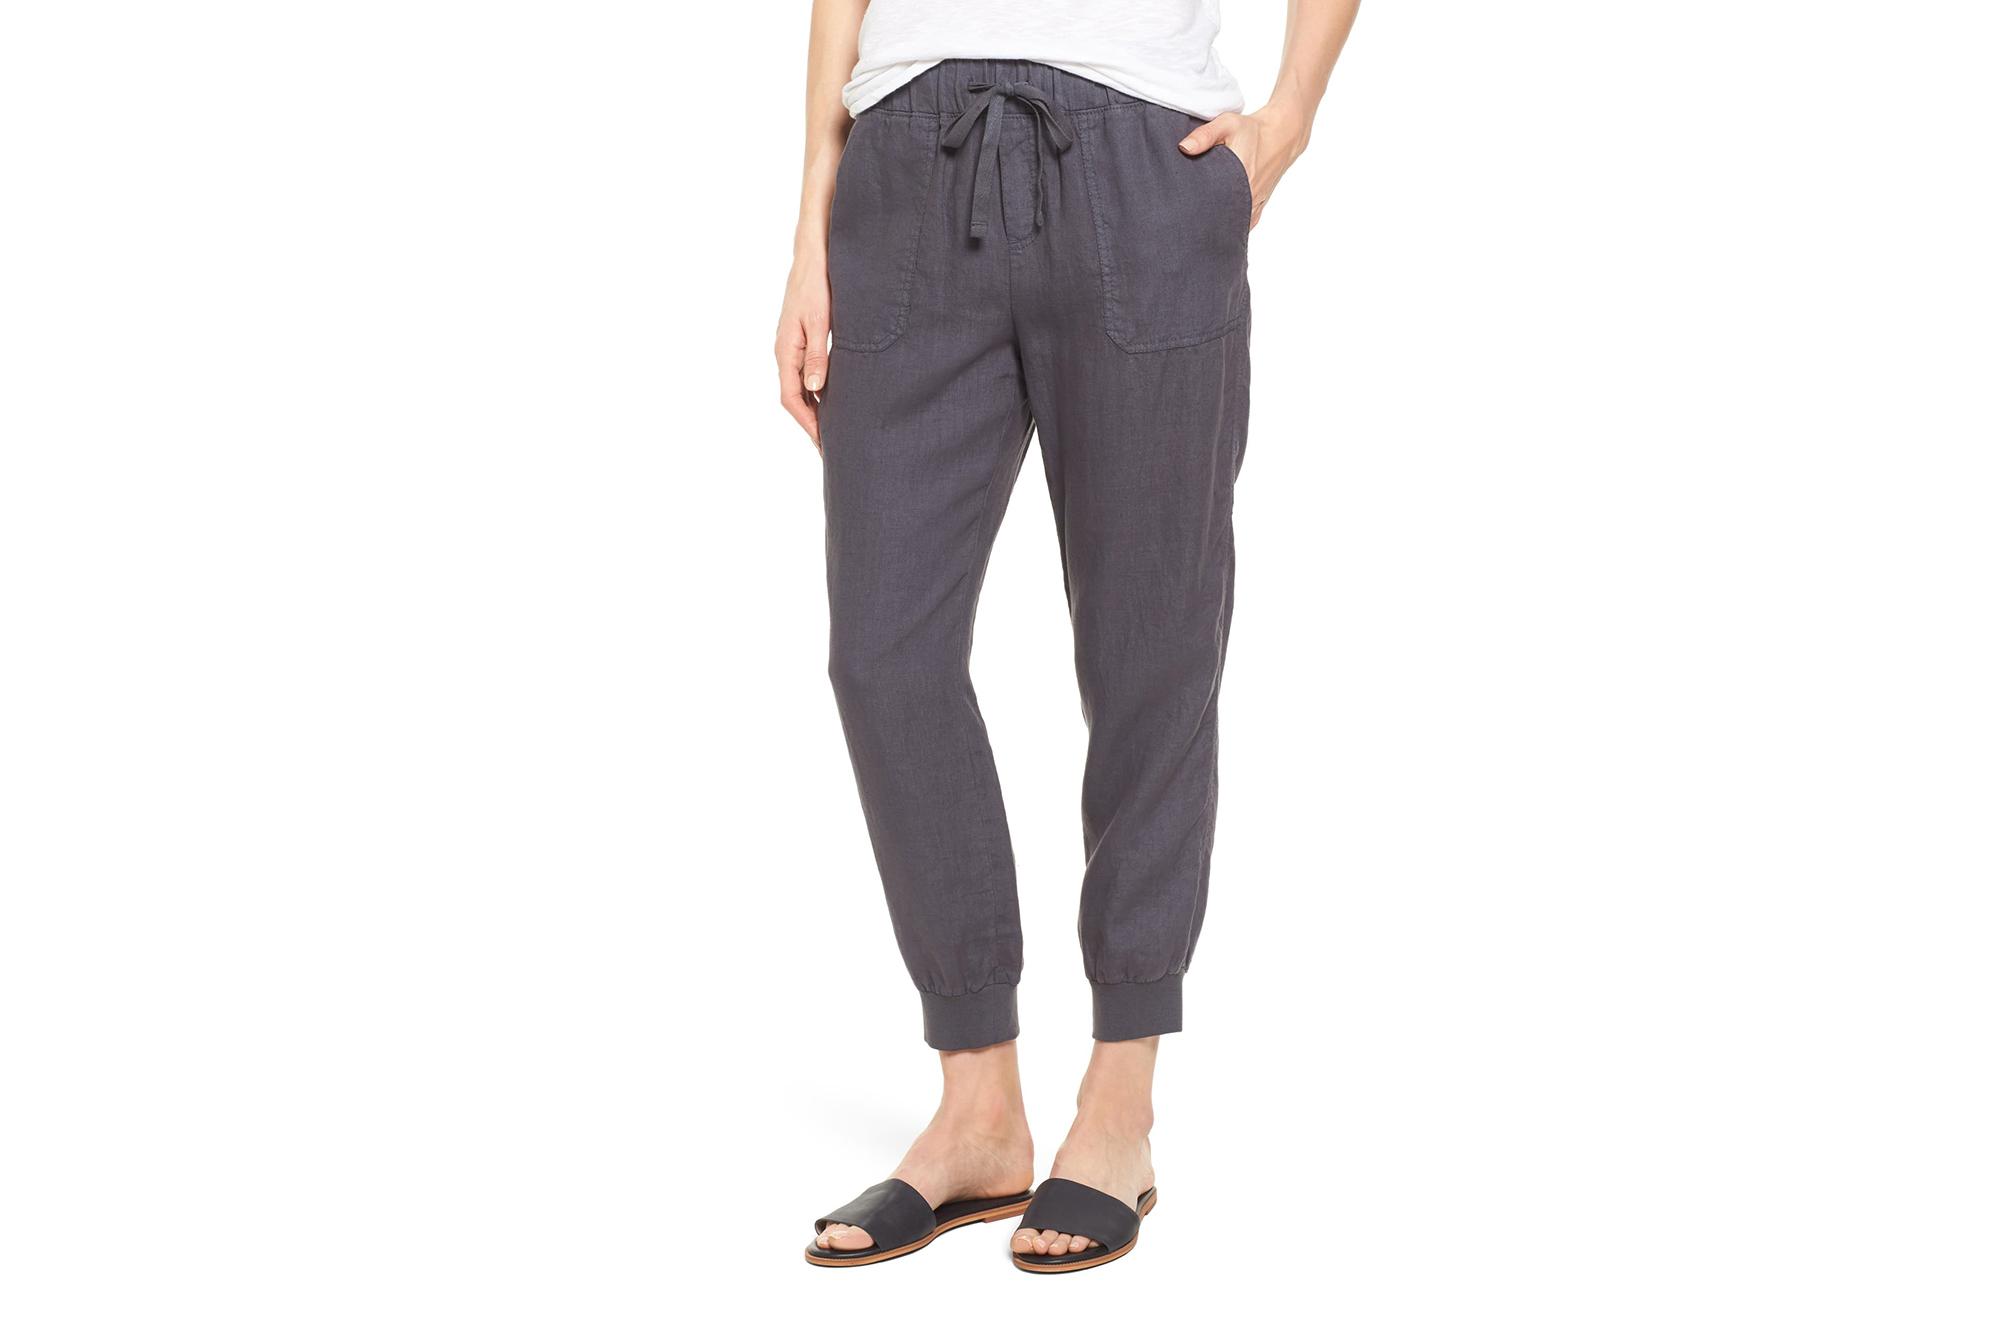 3f1c39d7f0f8e These Linen Joggers Are the Perfect Summer Sweatpants Alternative